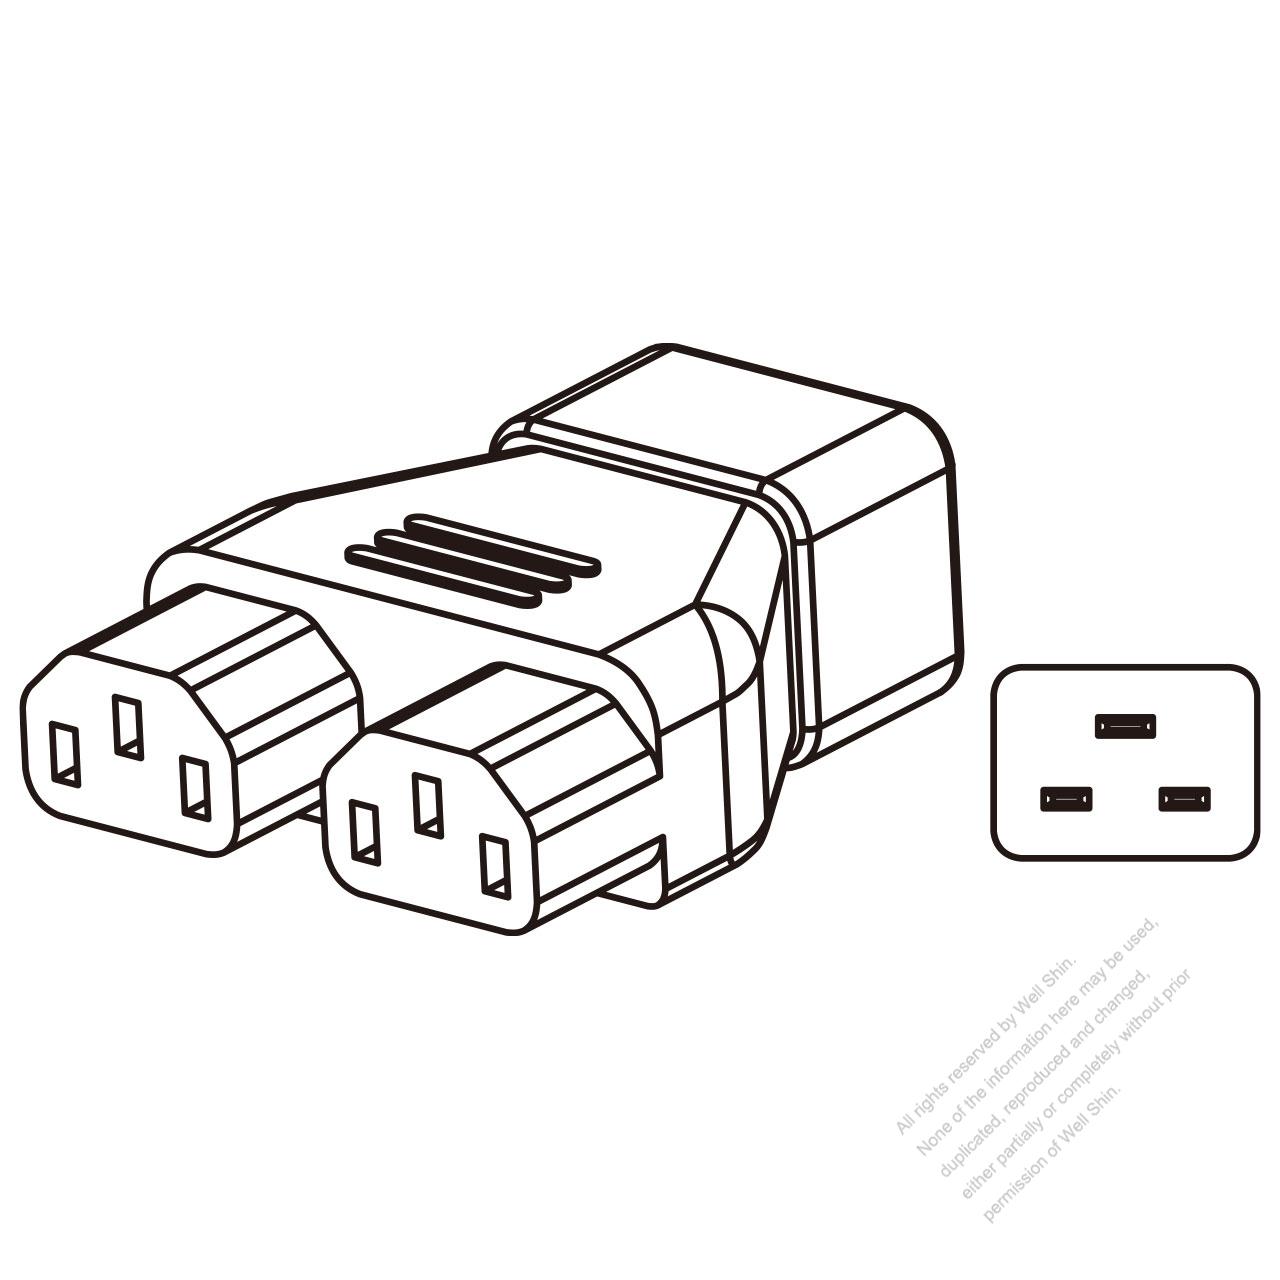 Adapter Plug Iec 320 Sheet I Inlet To Iec 320 C13 X 2 3